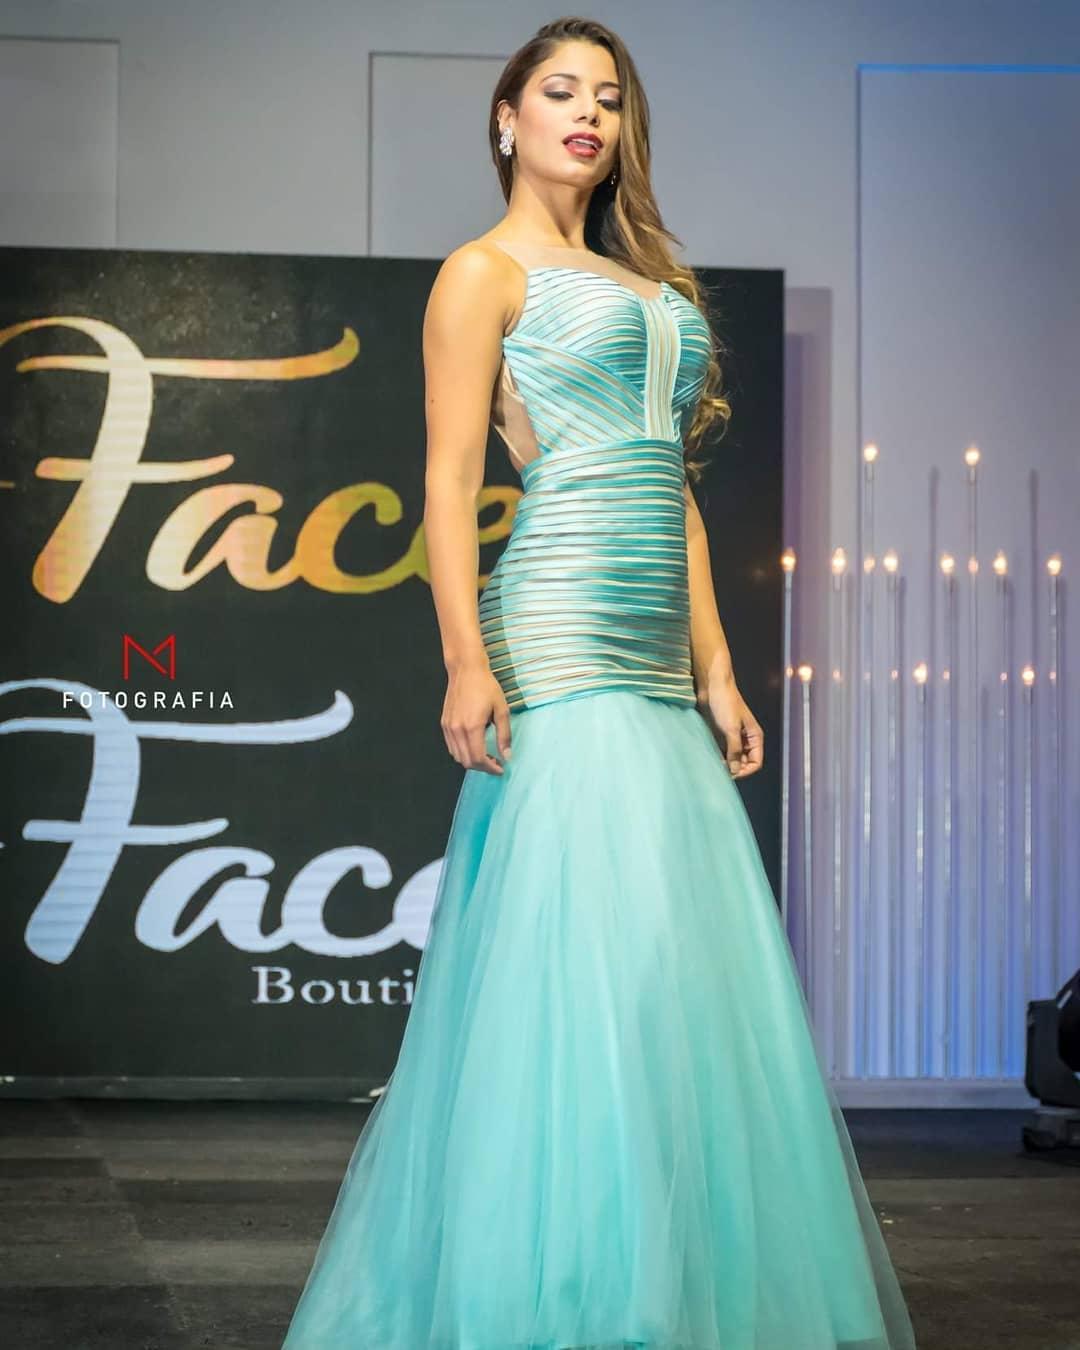 geraldine chaparro, miss usa hispanoamericana 2018/miss mundo latina turismo usa 2018. - Página 3 43341511